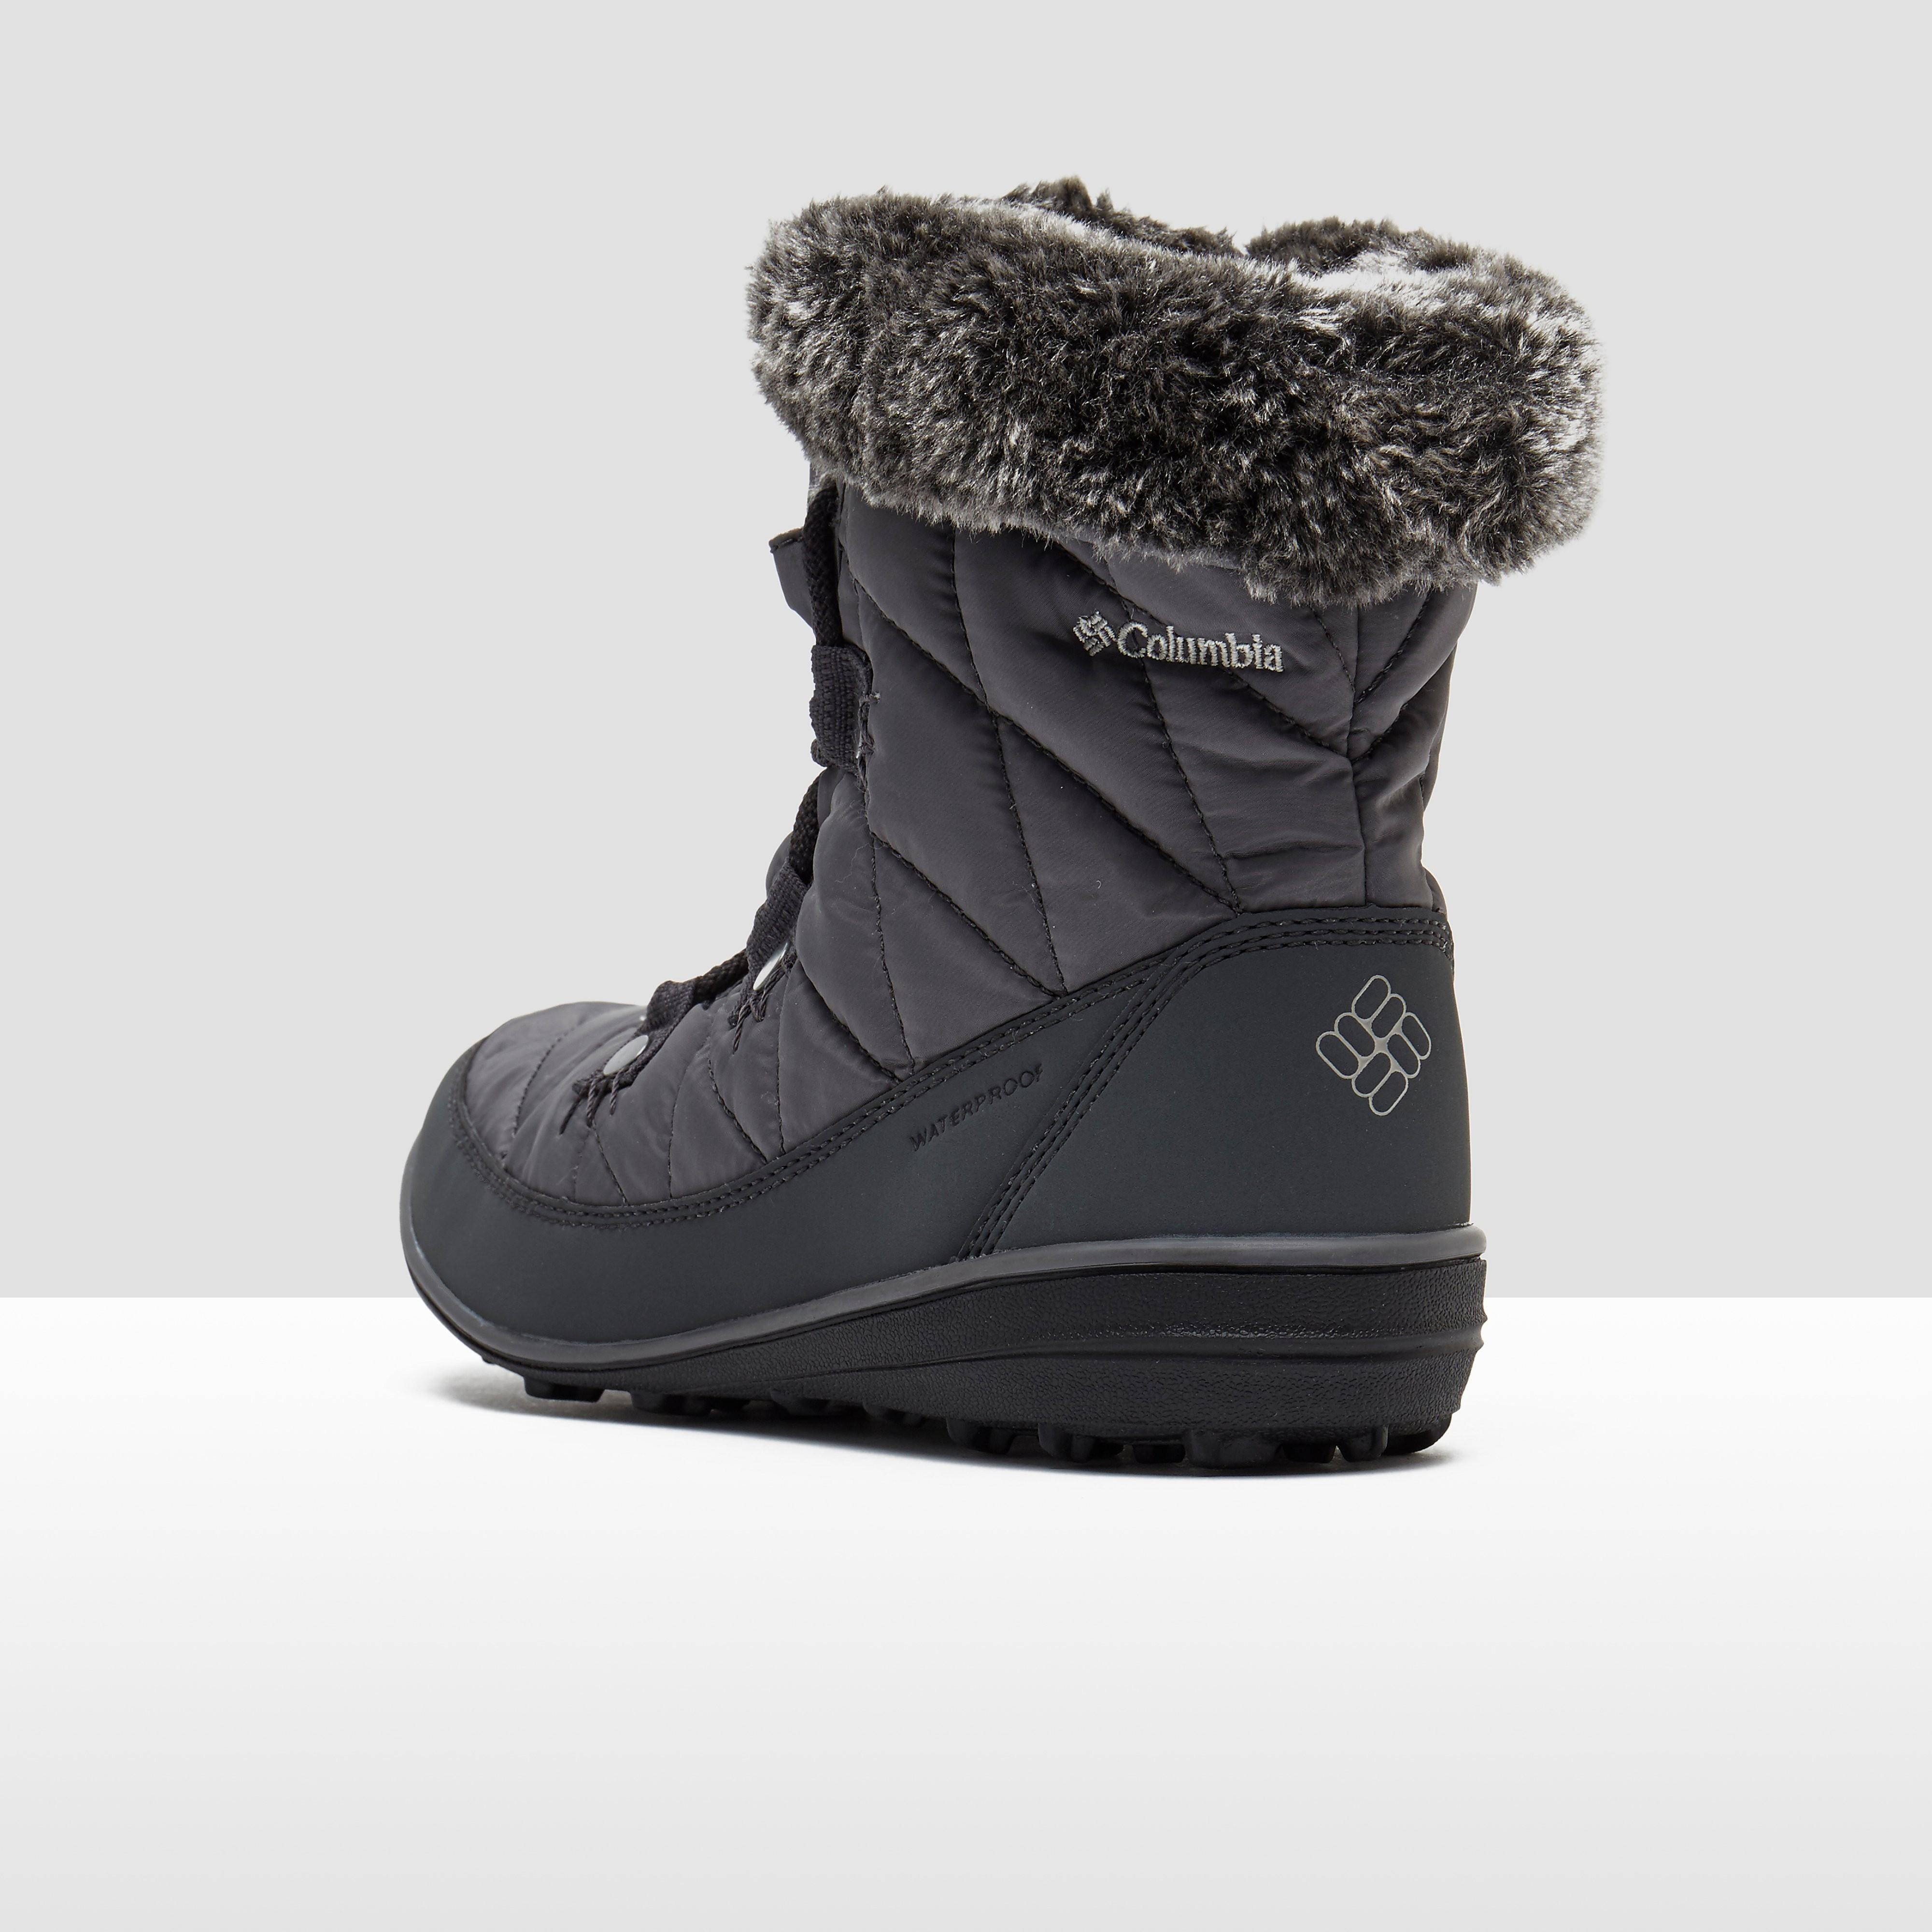 Columbia Women's Heavenly Shorty Omni-Heat Boots